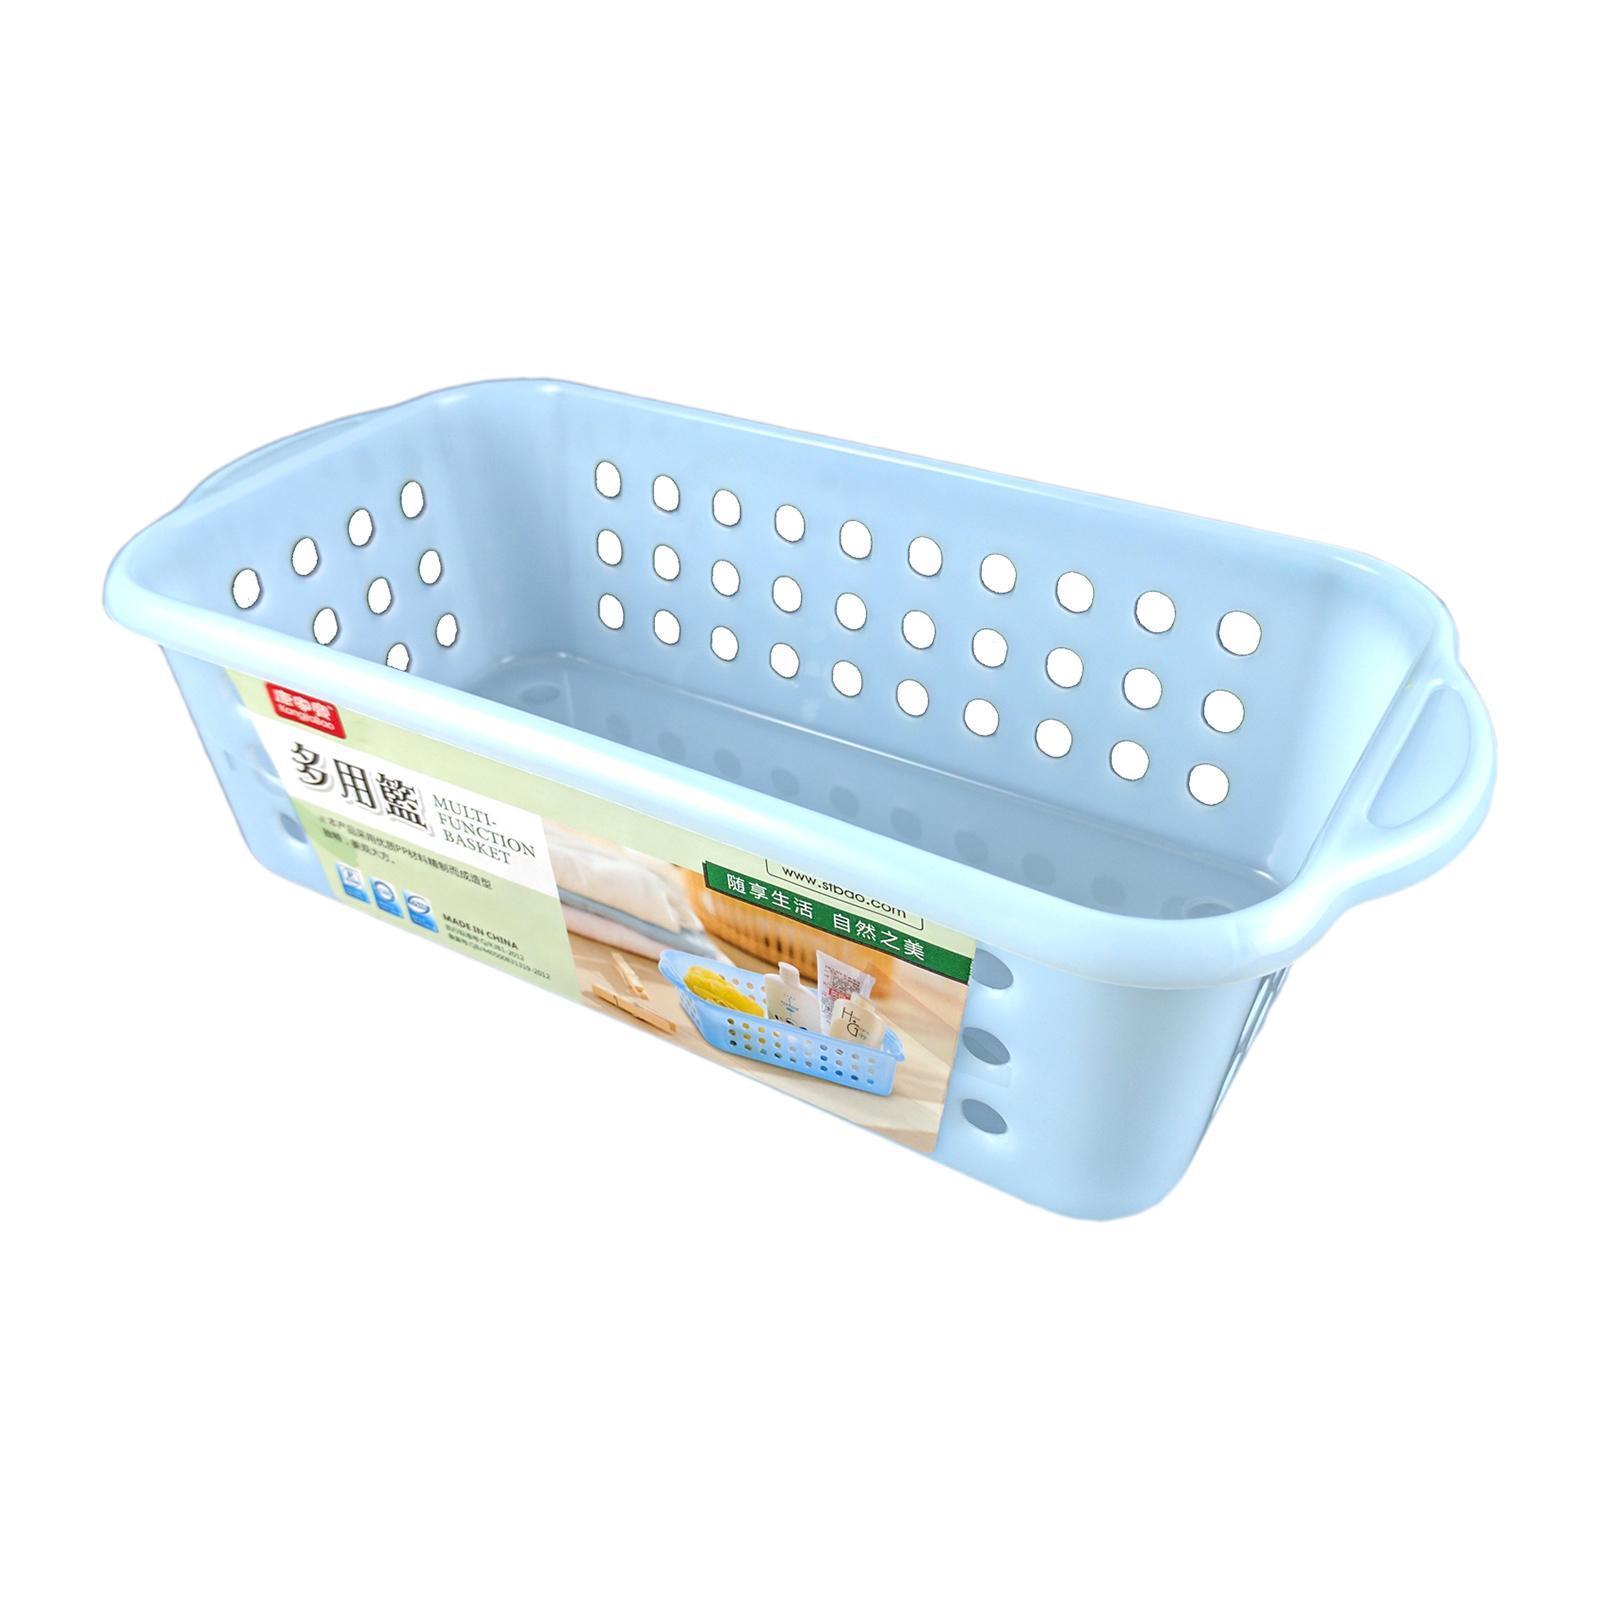 KangjiaBao Plastic Organiser Tray (2 per Pack) - Blue